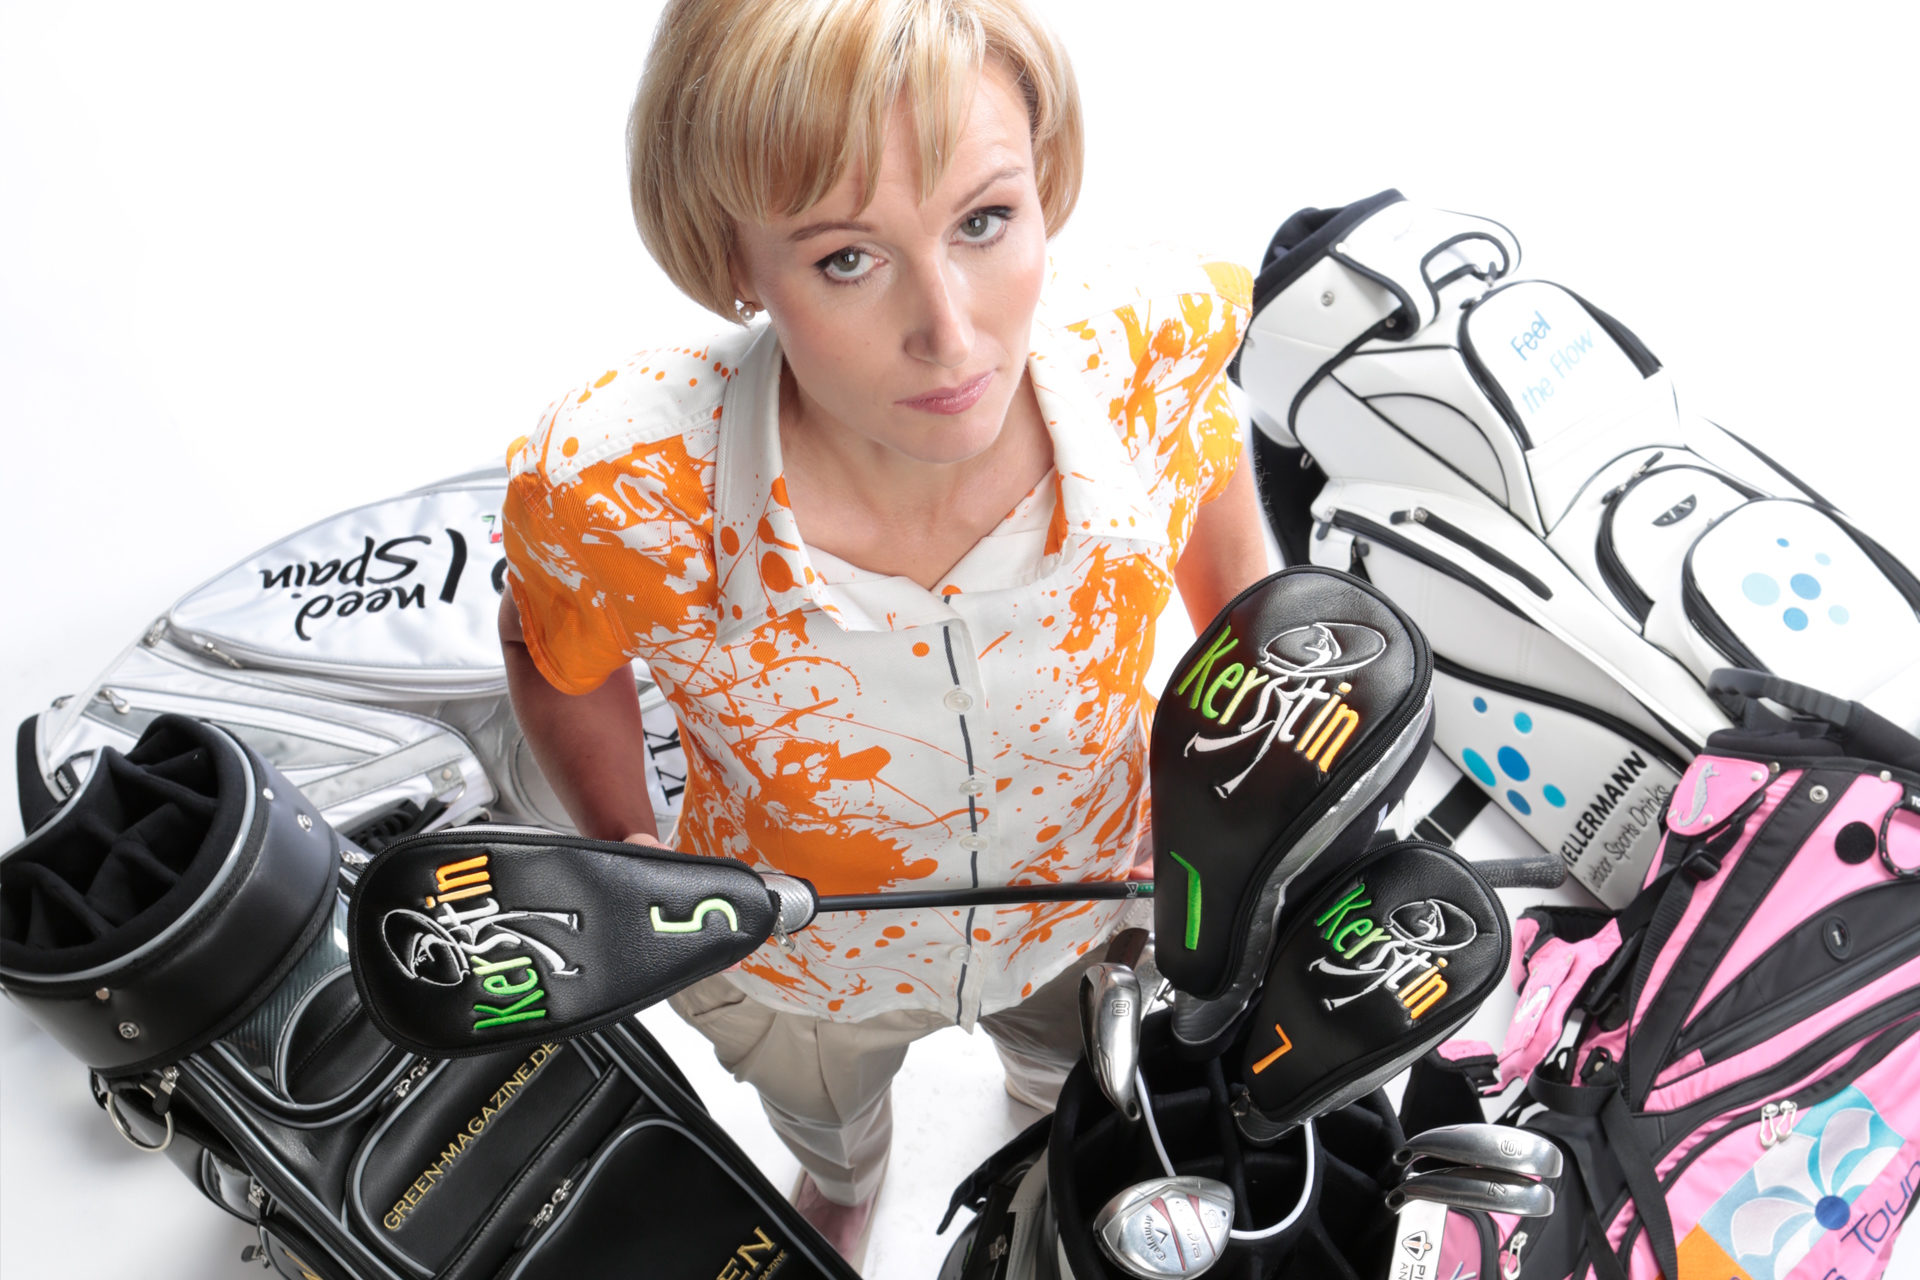 BLOG: I love golf bags